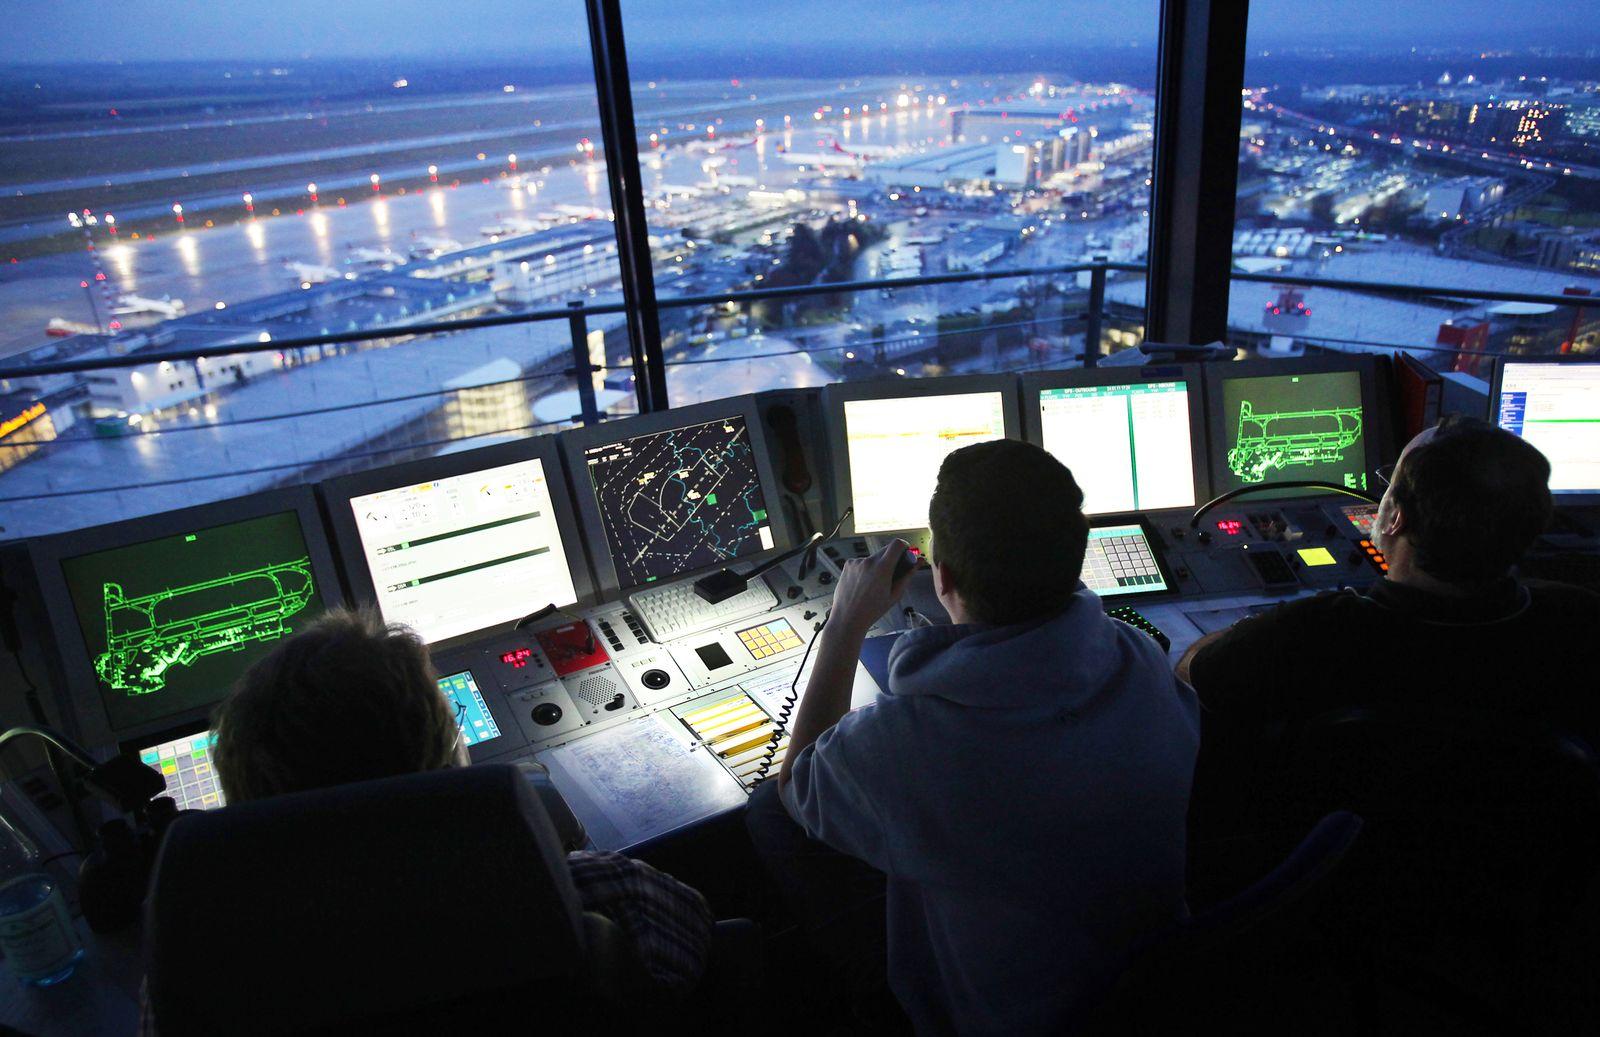 Flugsicherung / Fluglotse / Flughafen Düsseldorf